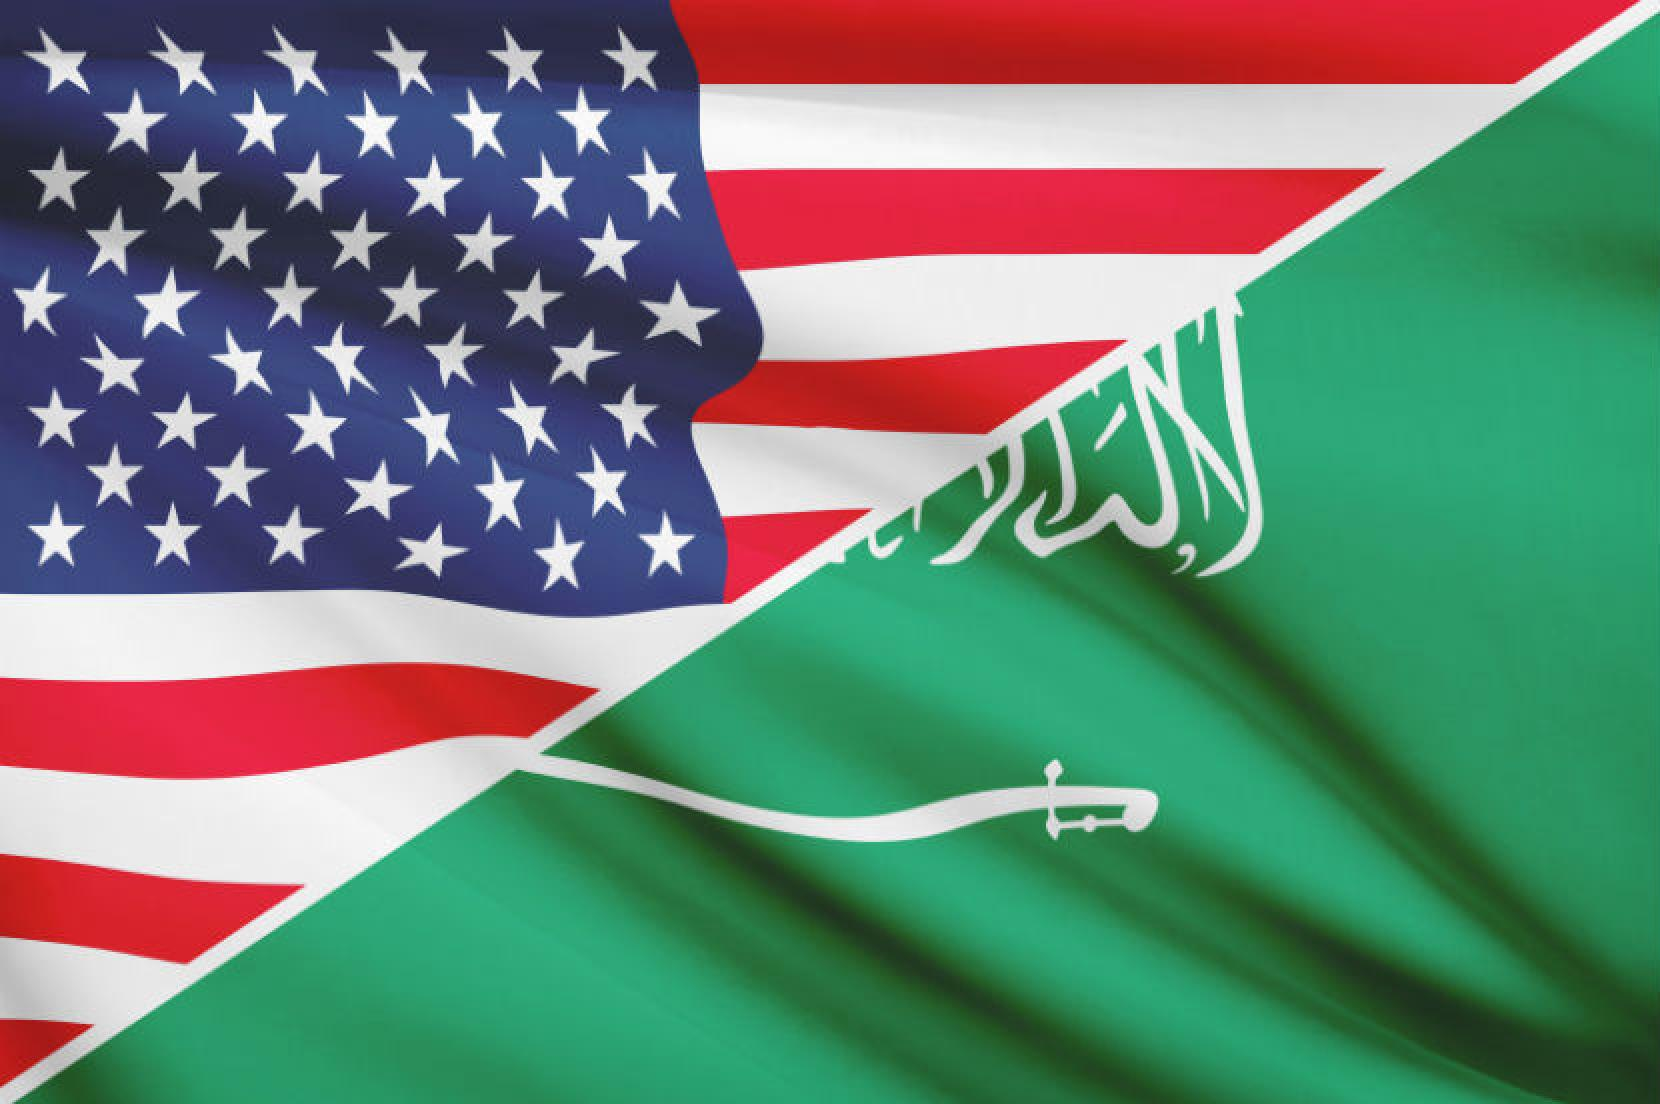 Saudi Arabia Reacts to Preparation for Astana Talks